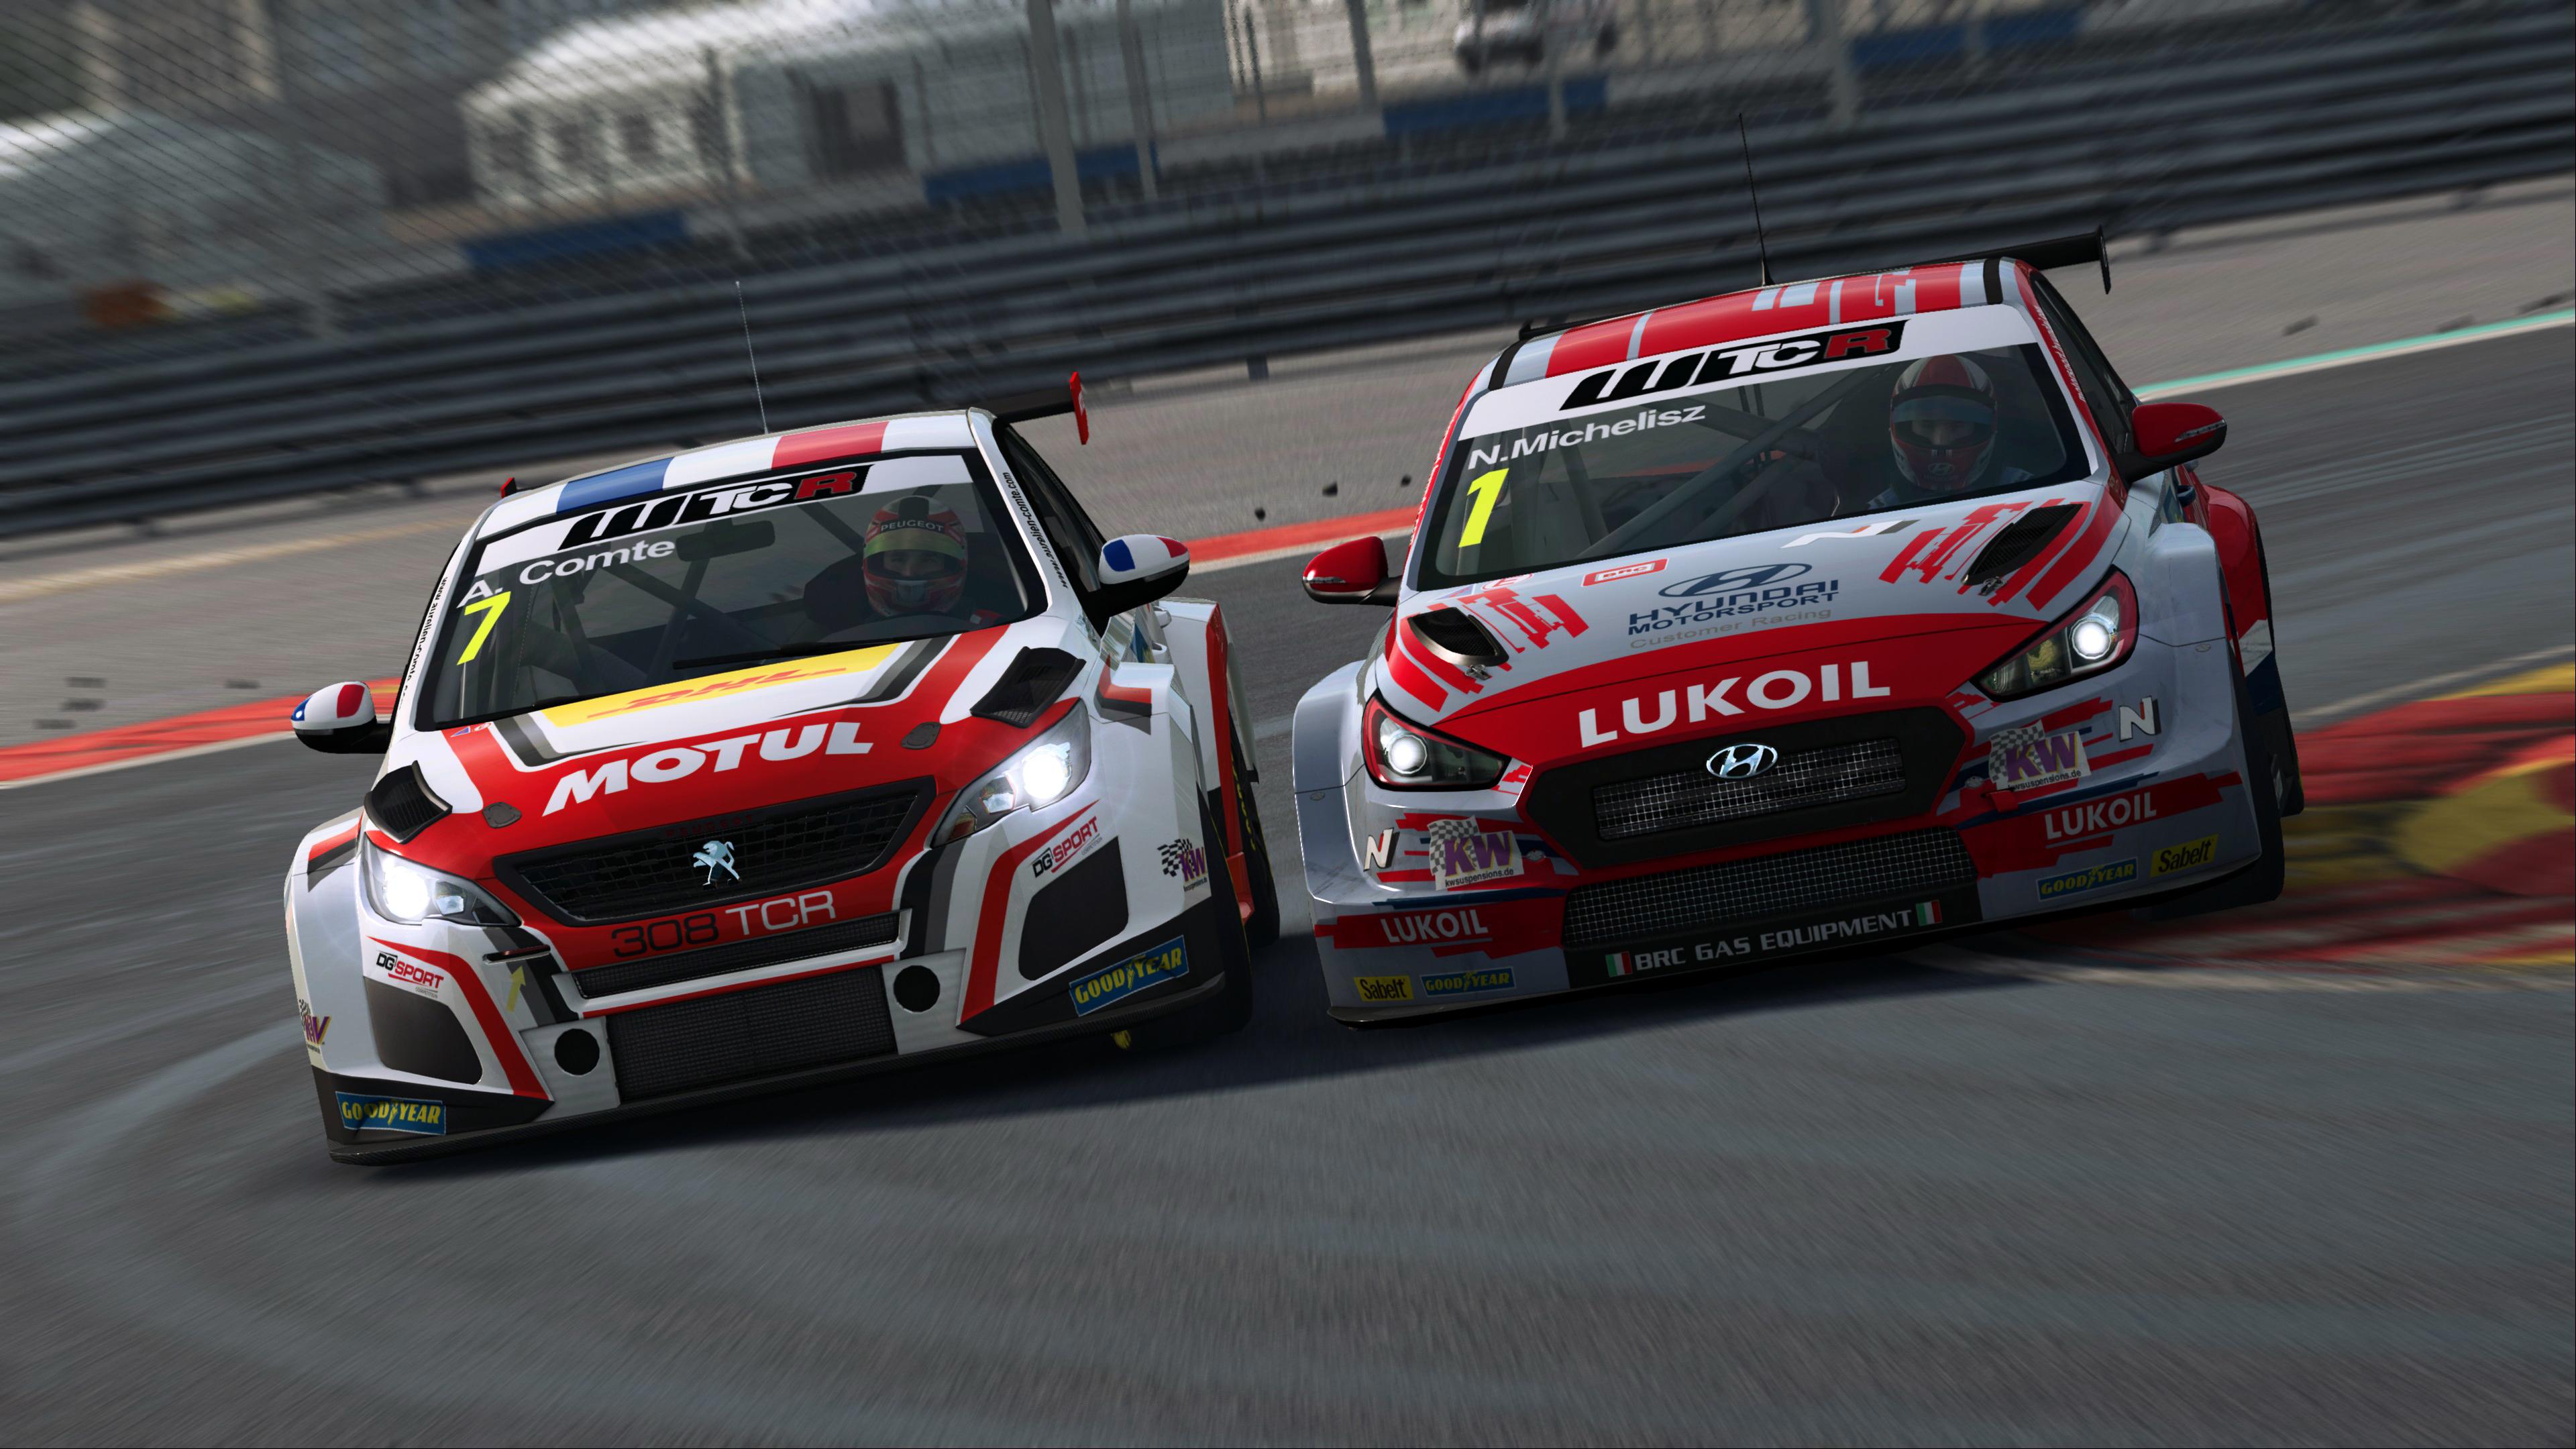 03-norbert-michelisz-passes-aurelien-comte-for-the-lead-in-race-2.jpg